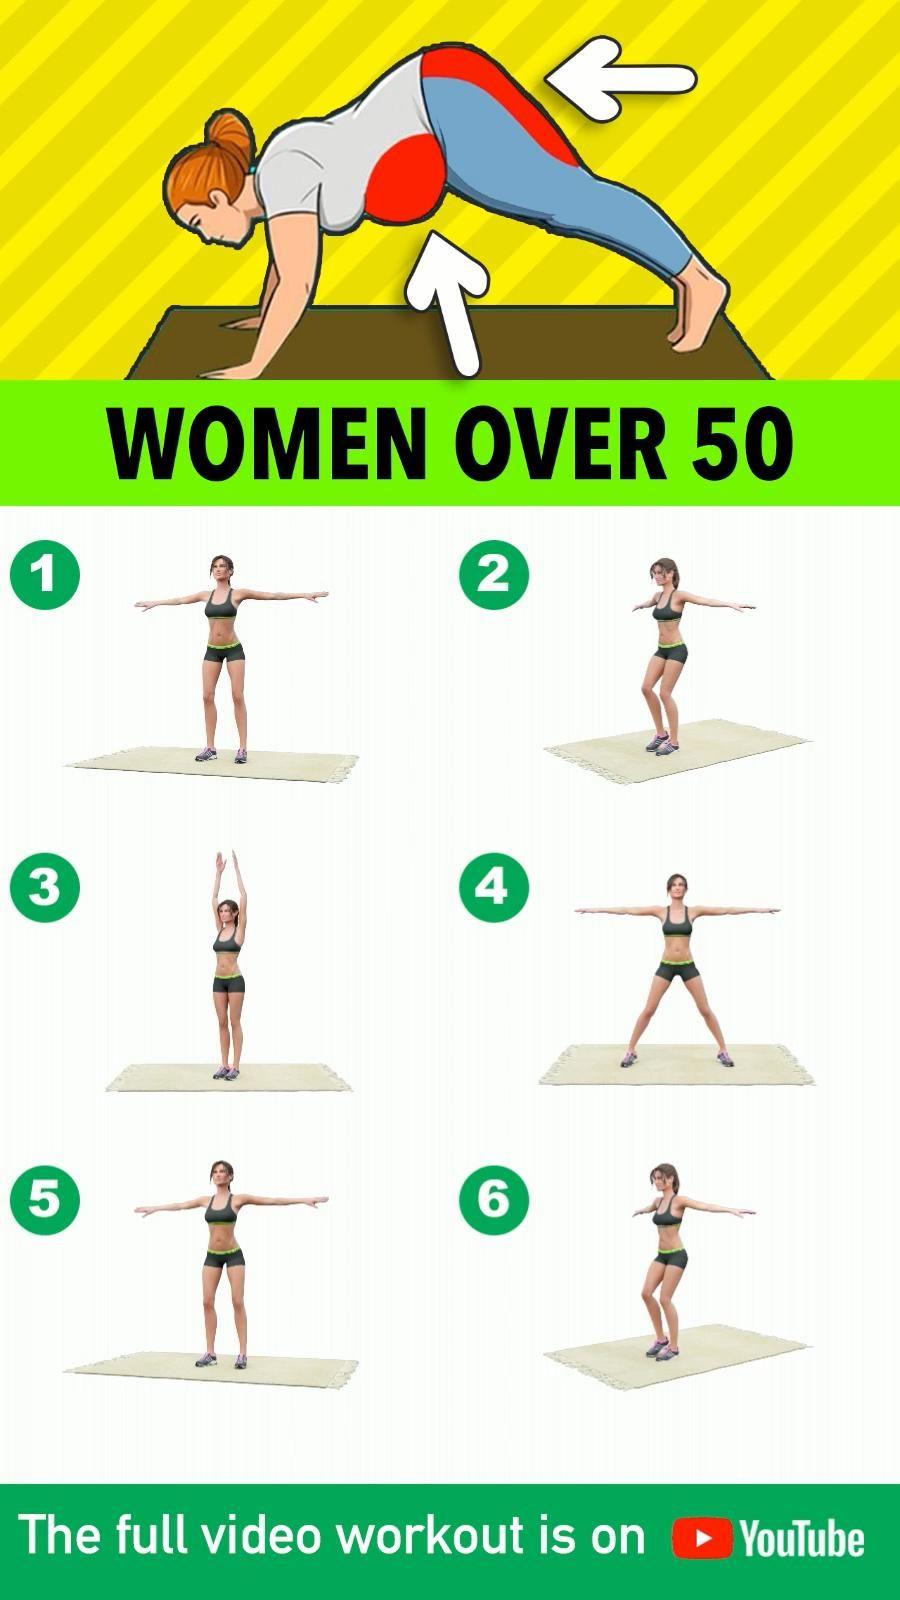 4 Best Exercises For Women Over 50